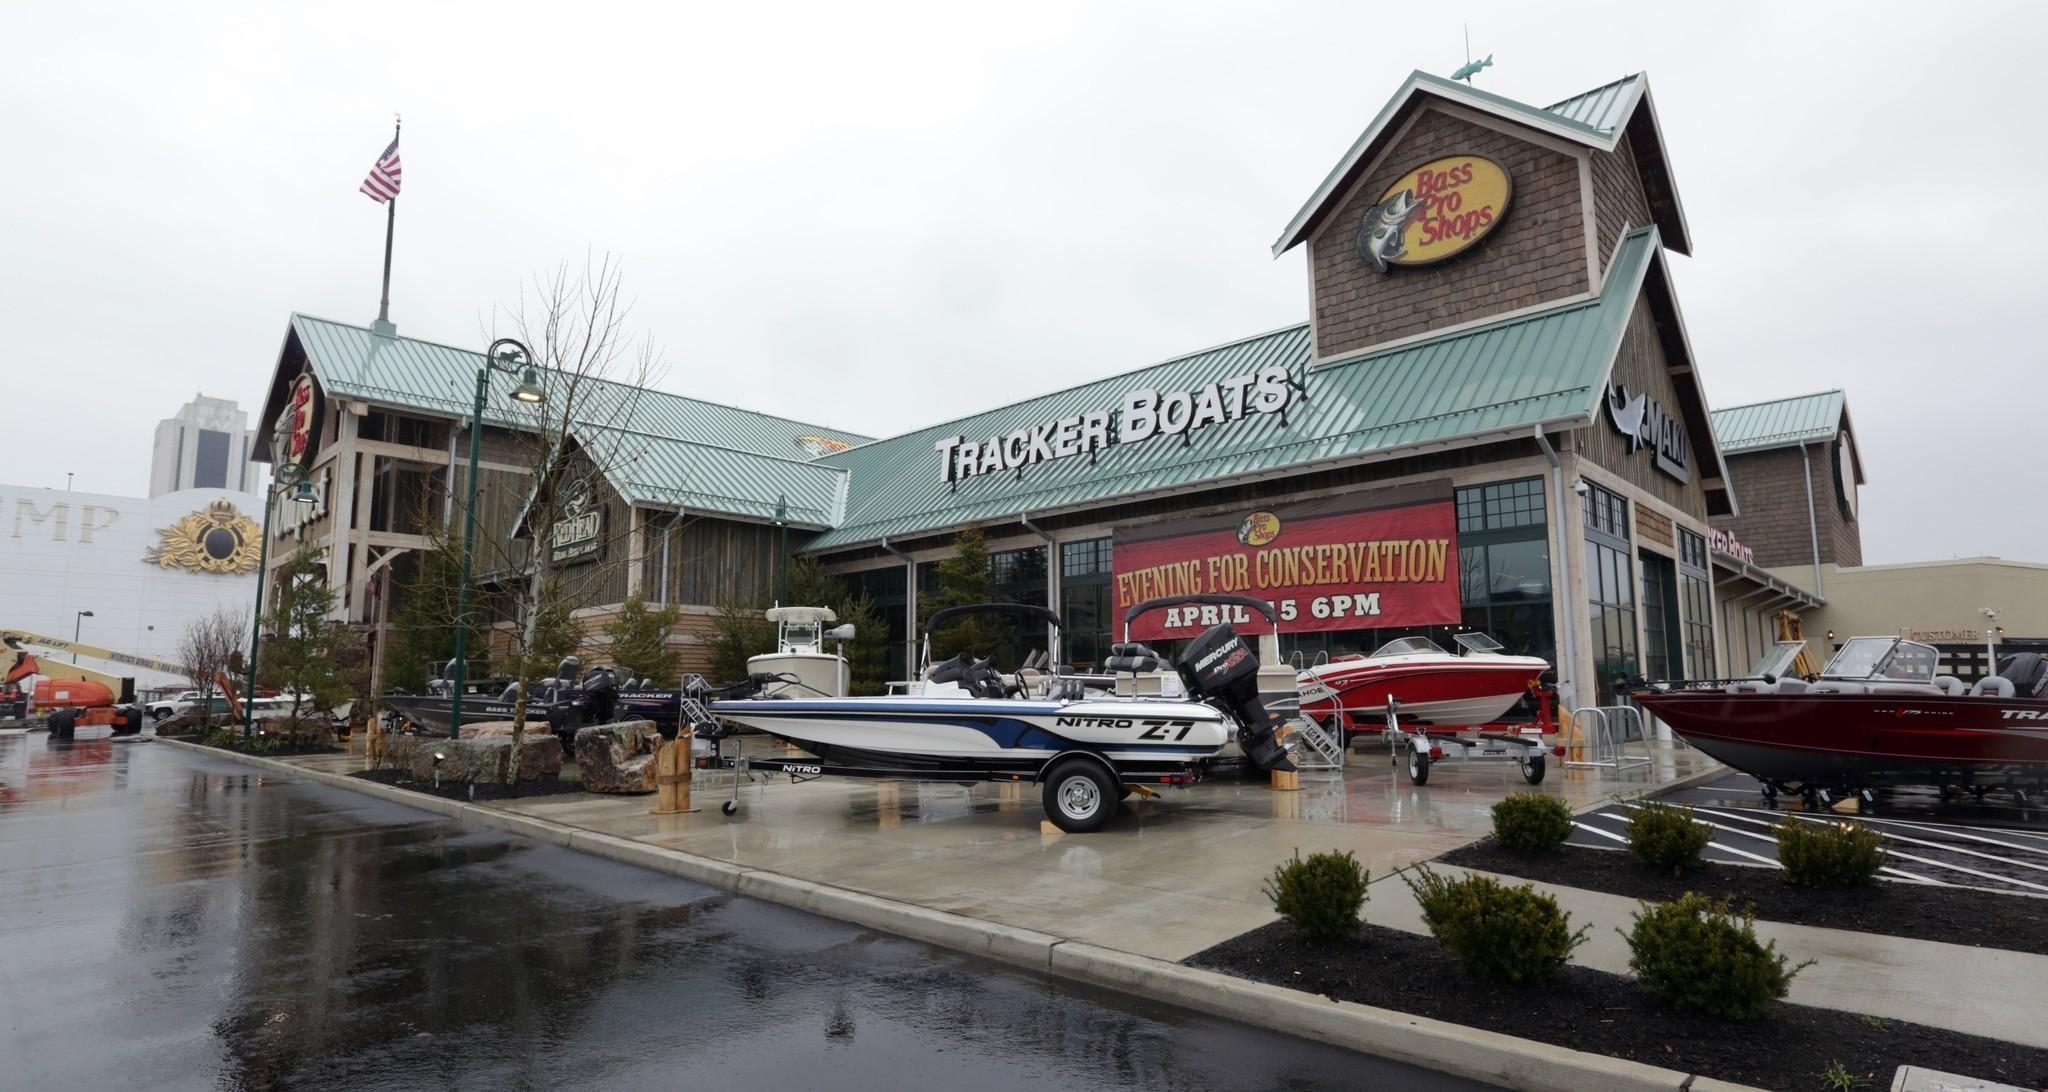 Bass Pro Shops an unconventional Atlantic City retailer doing well